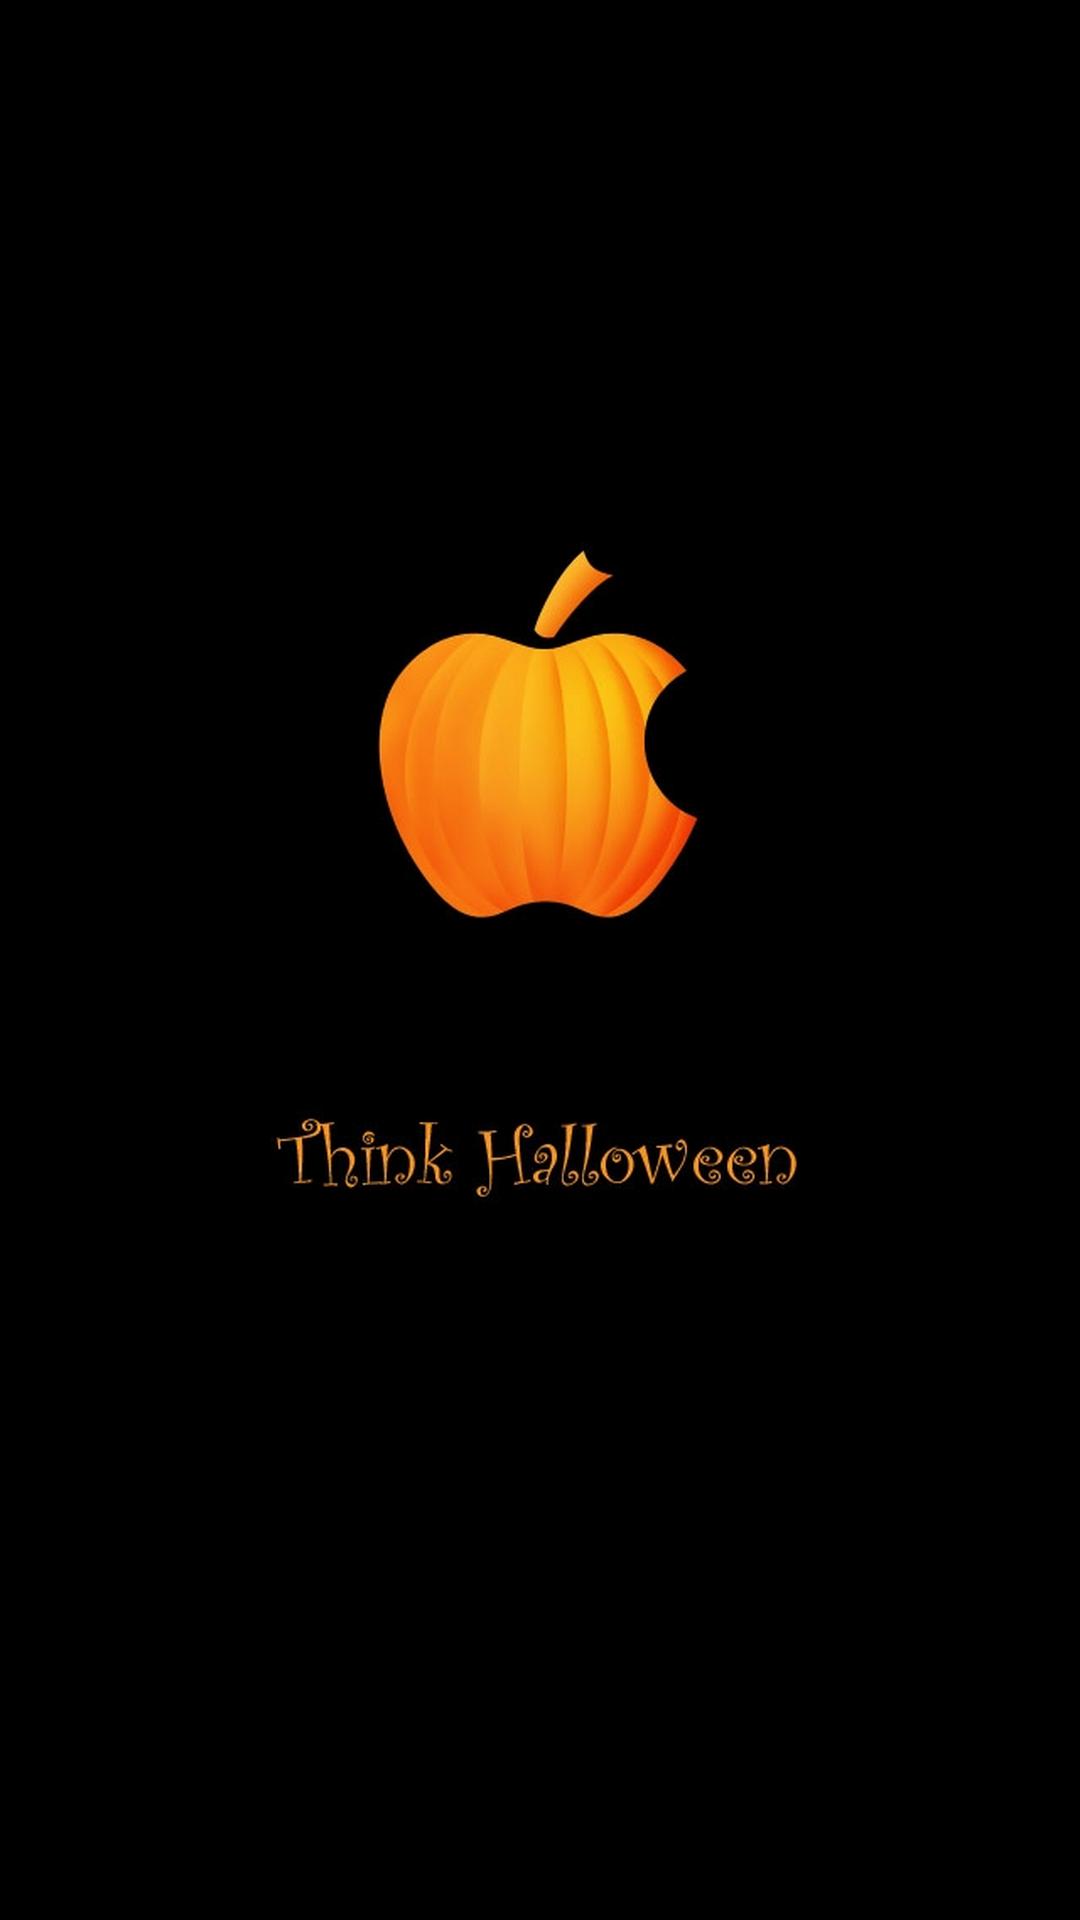 50 Halloween Wallpaper Iphone 6 Plus On Wallpapersafari